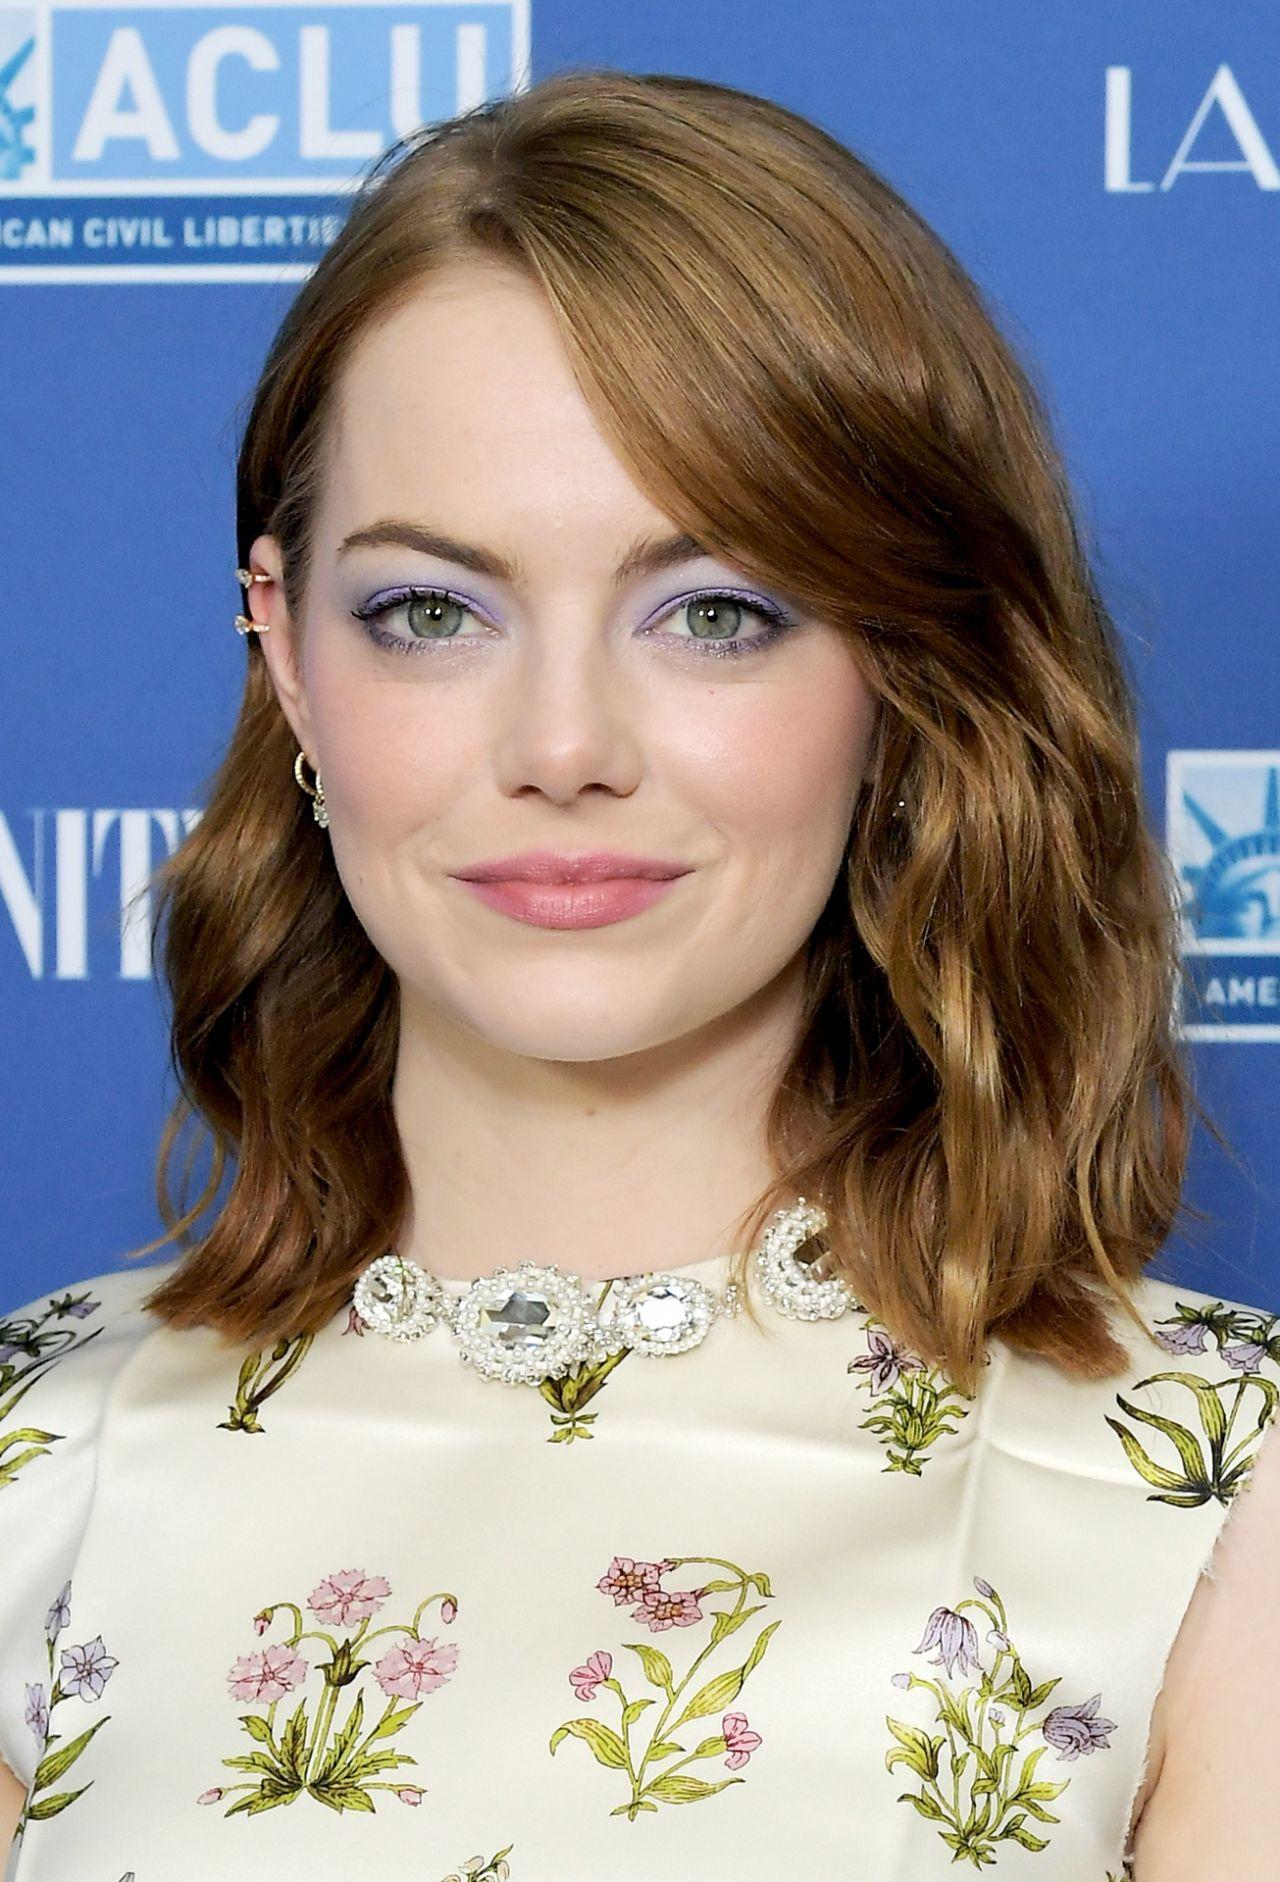 Emma Stone Vanity Fair Photoshoot Emma Stone - Vanity Fa...